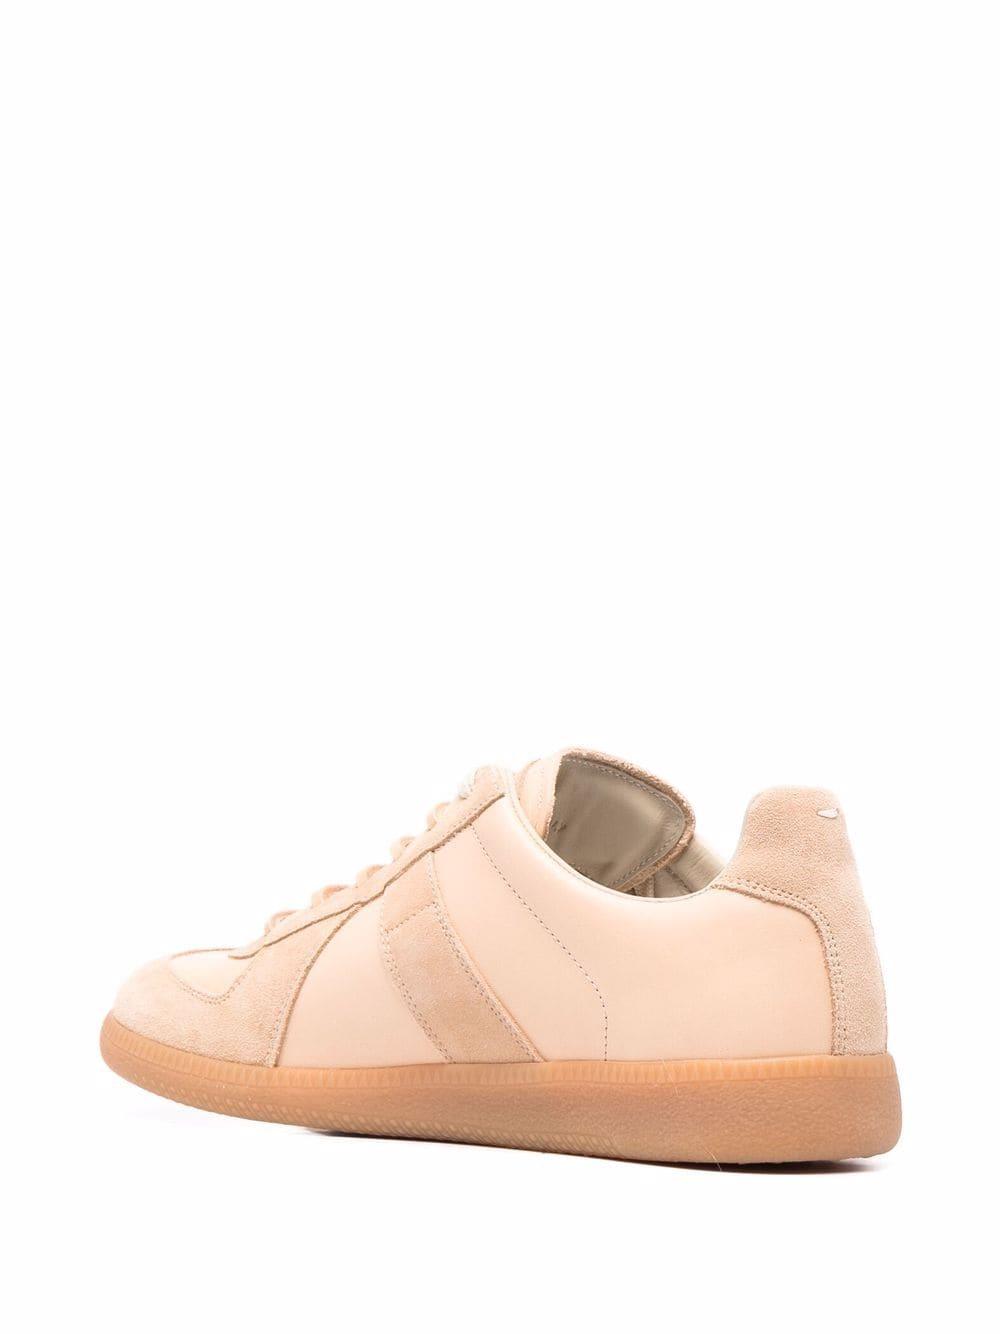 REPLICA SNEAKERS MAN MAISON MARGIELA | Sneakers | S57WS0408 P4306T2059